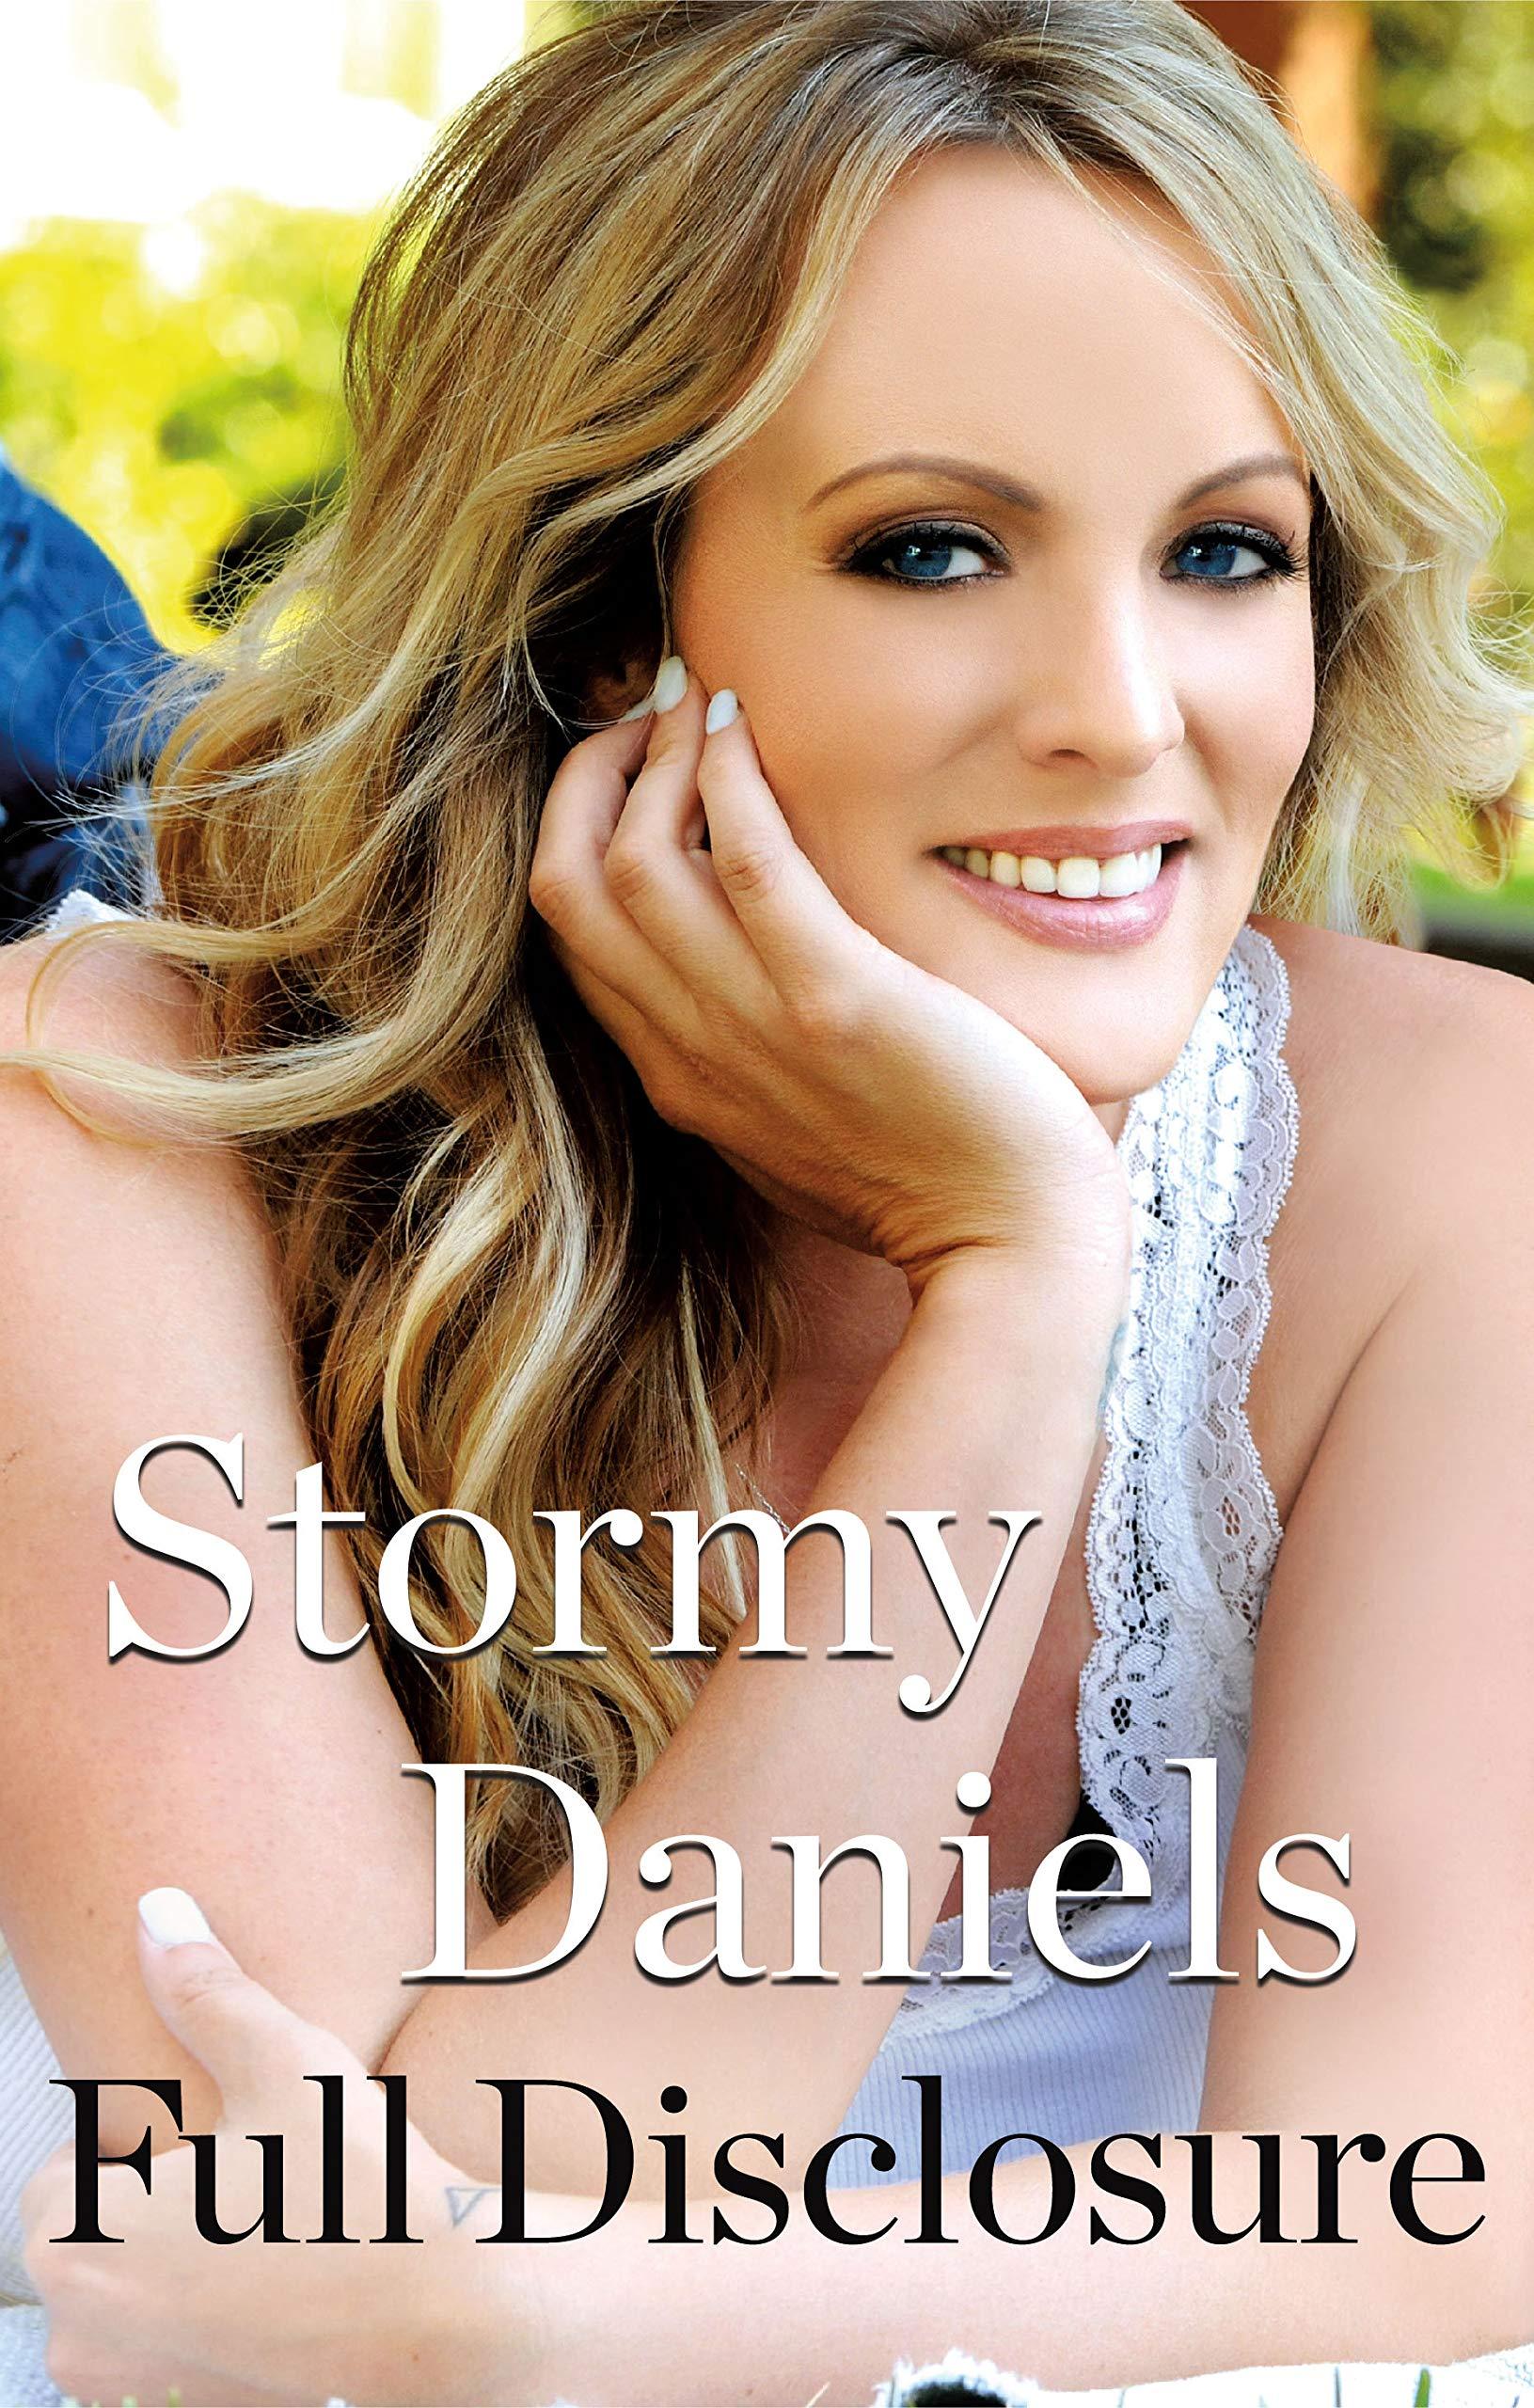 Details on Stormy Daniels' memoir slowly appearing in advance of publication